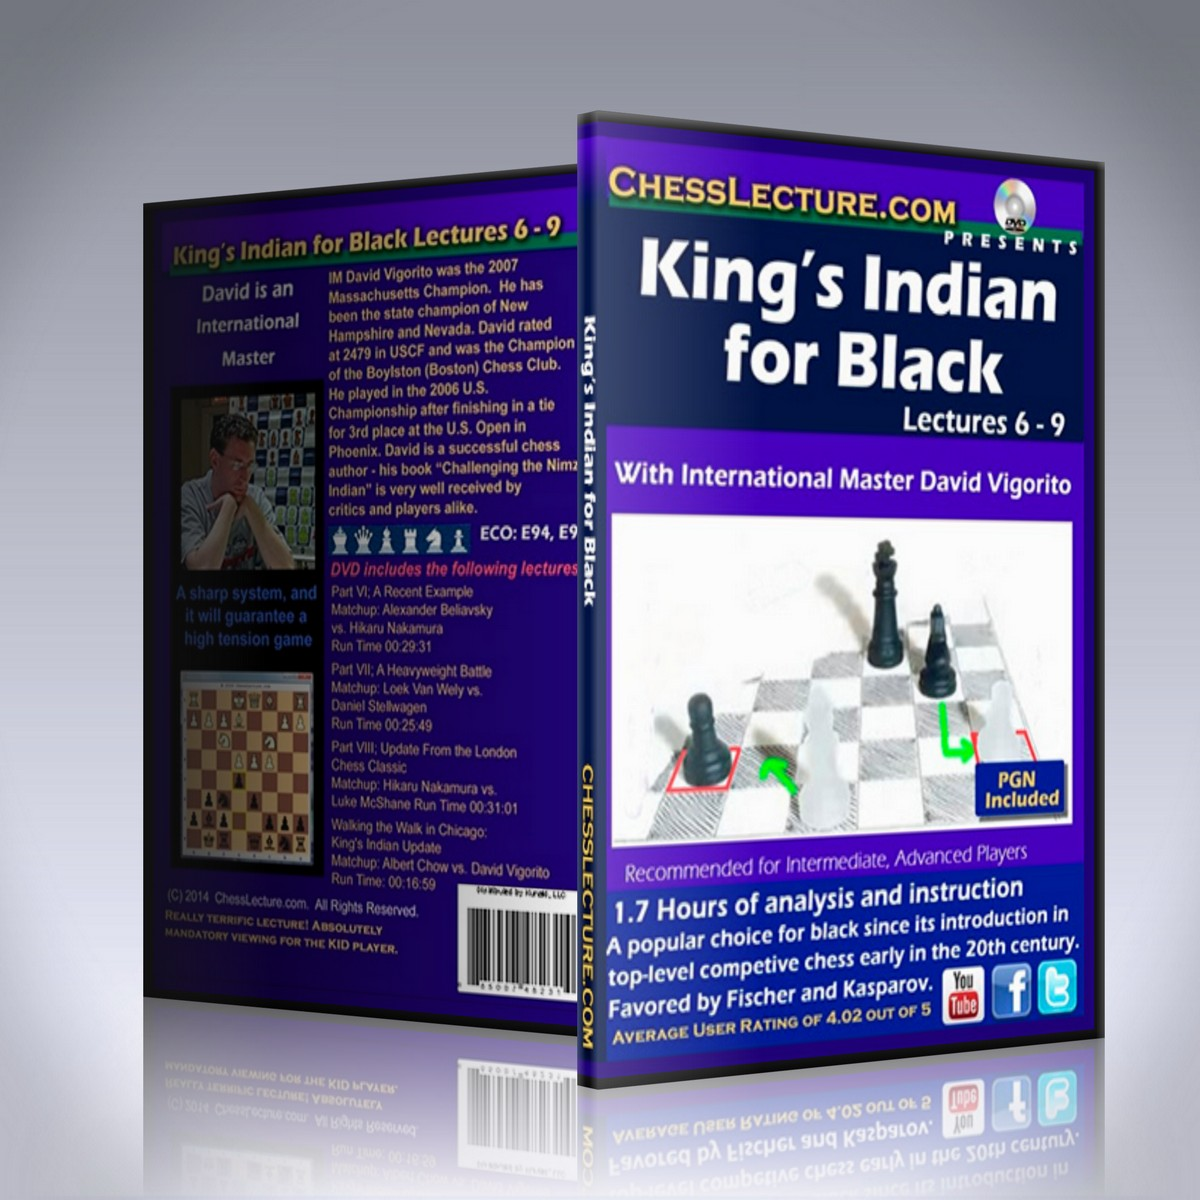 King's Indian for Black lectures 6-9 – IM David Vigorito